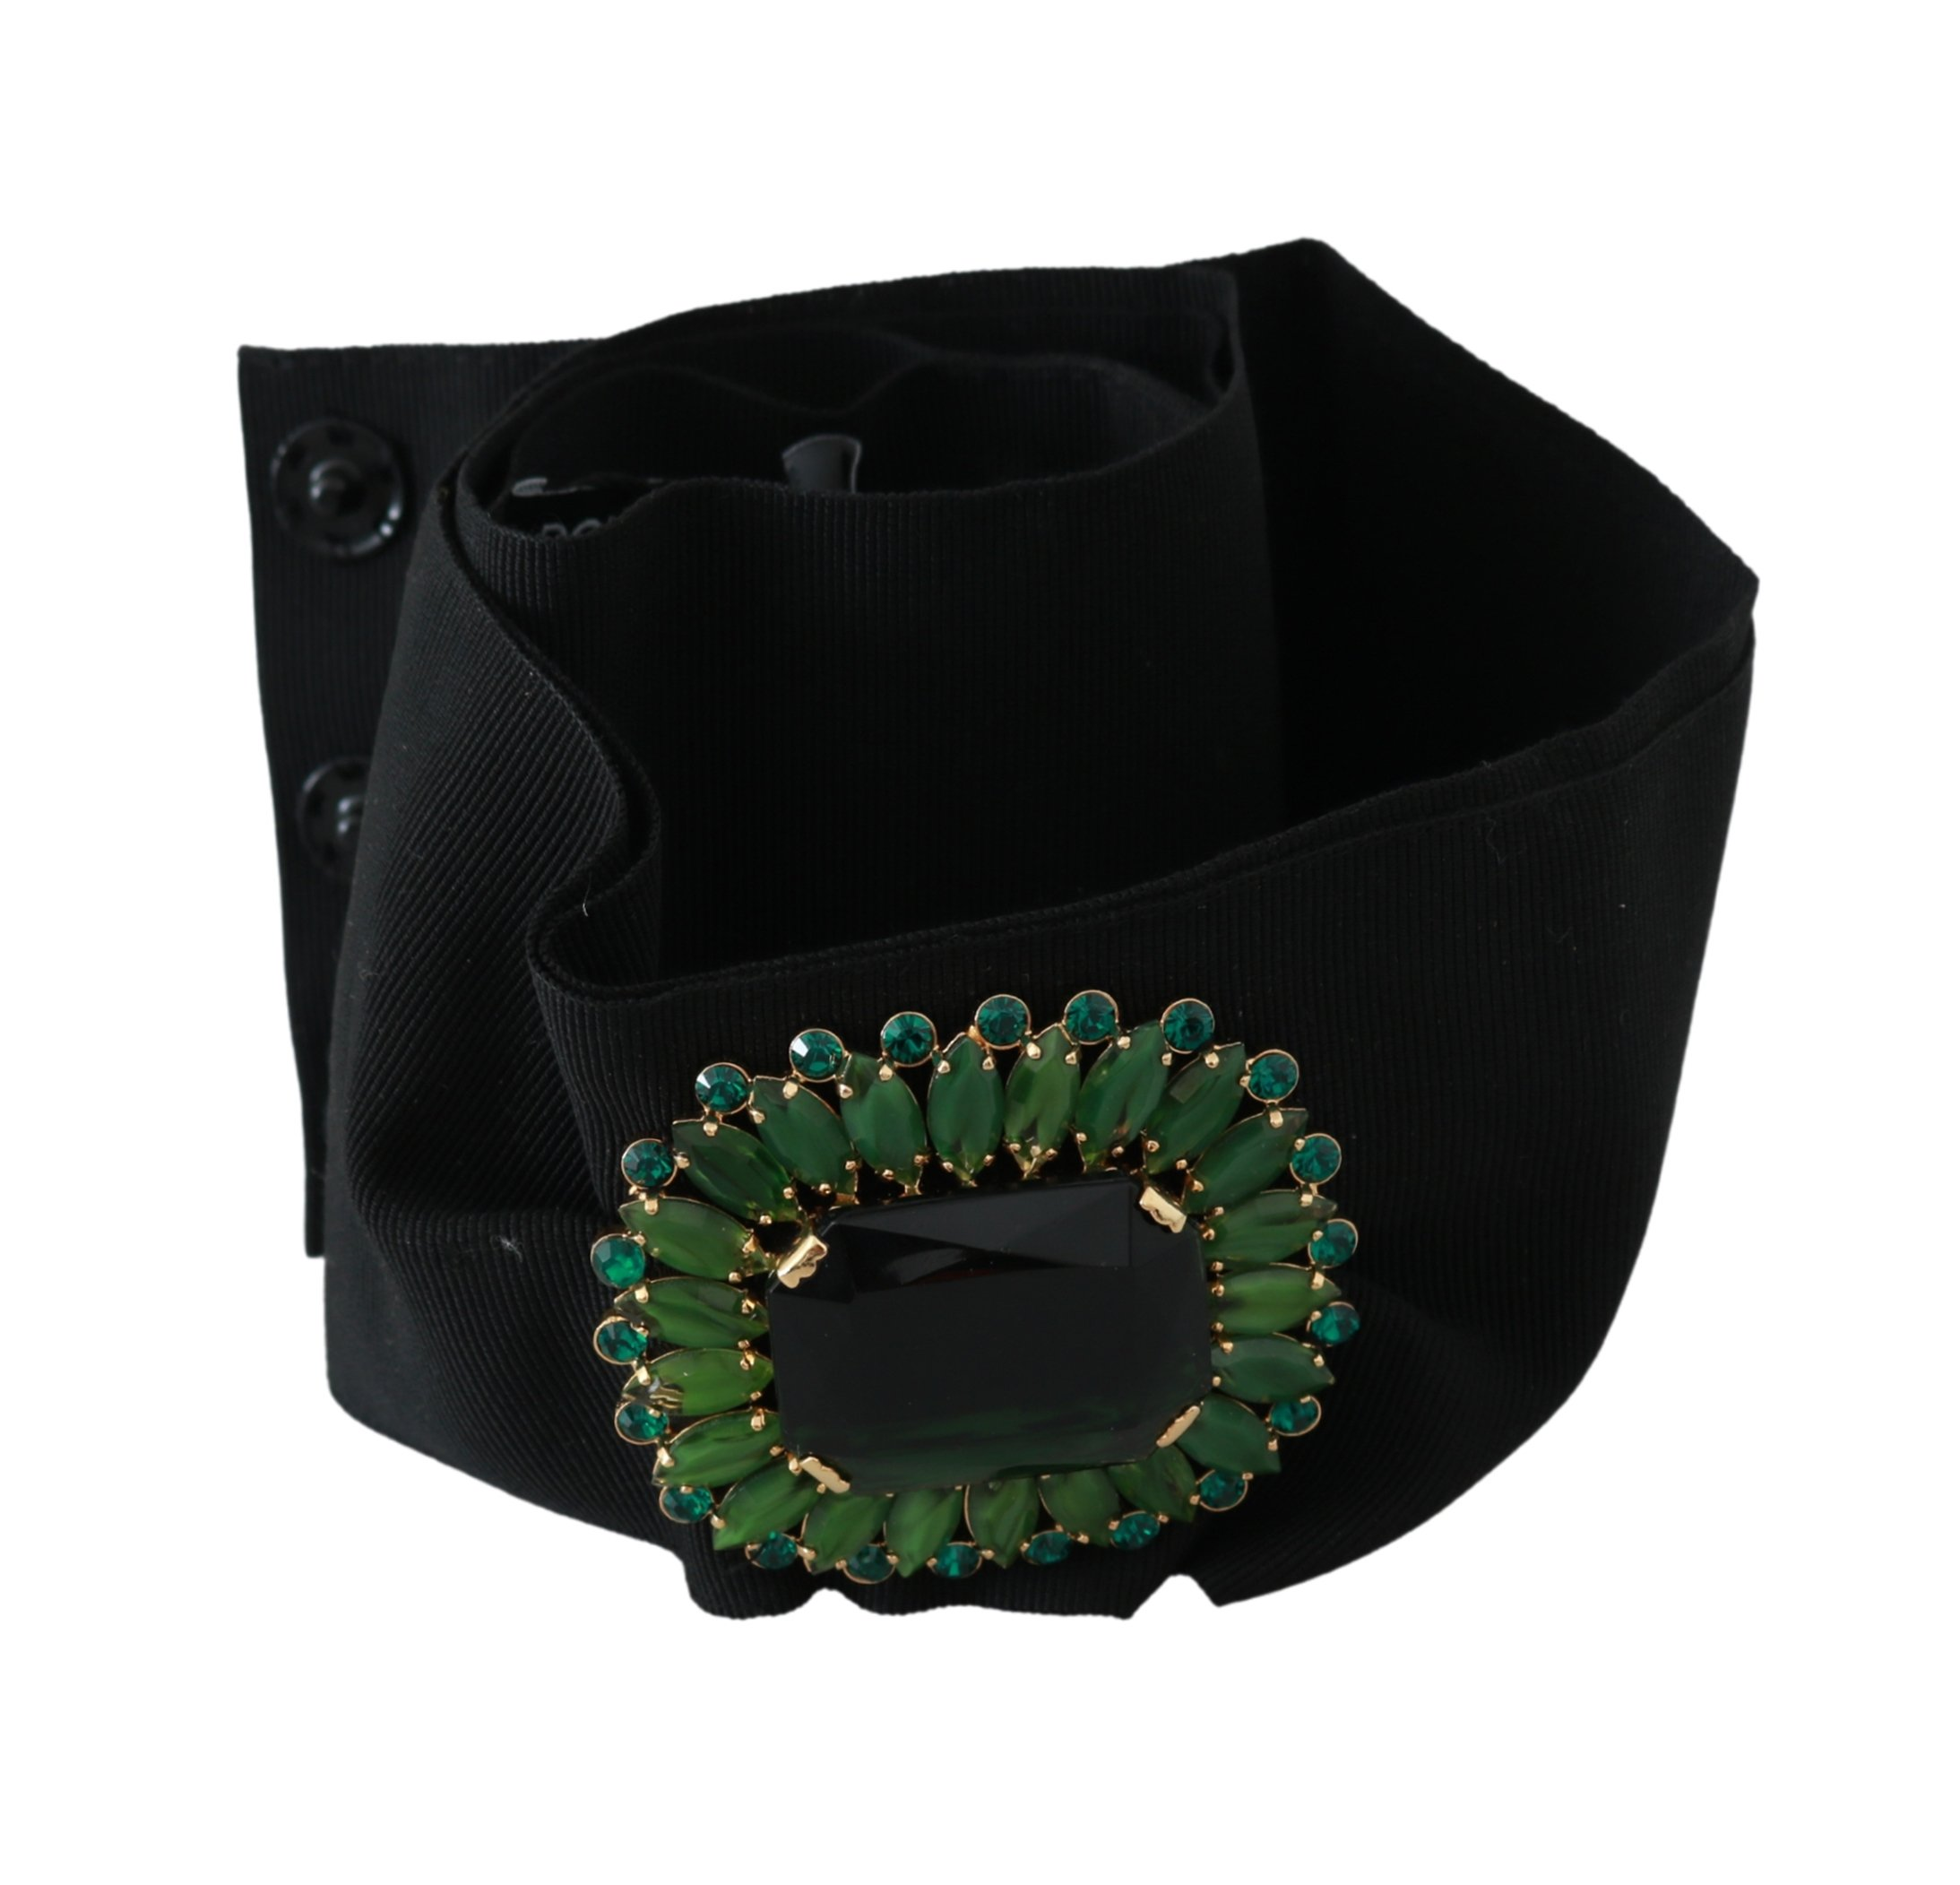 Dolce & Gabbana Women's Stretch Crystal Wide Waist Belt Black BEL60545 - 100 cm / 40 Inches